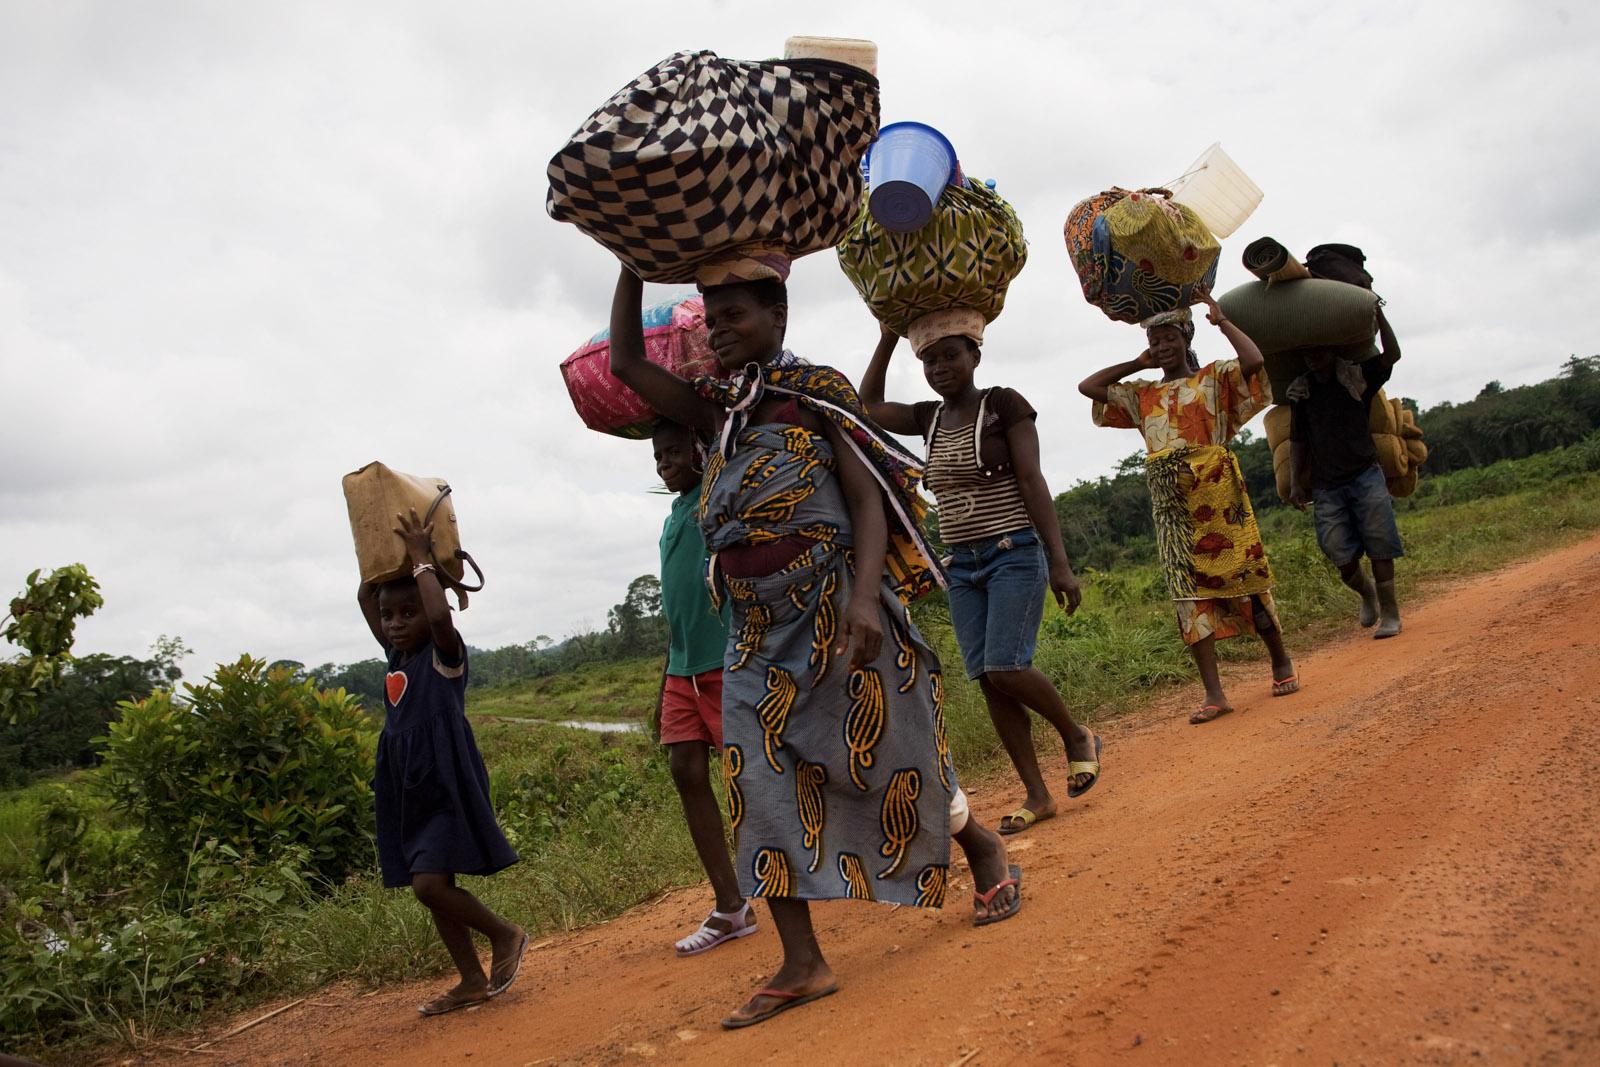 liberia-refugies-ivoiriens-0311-9684hd